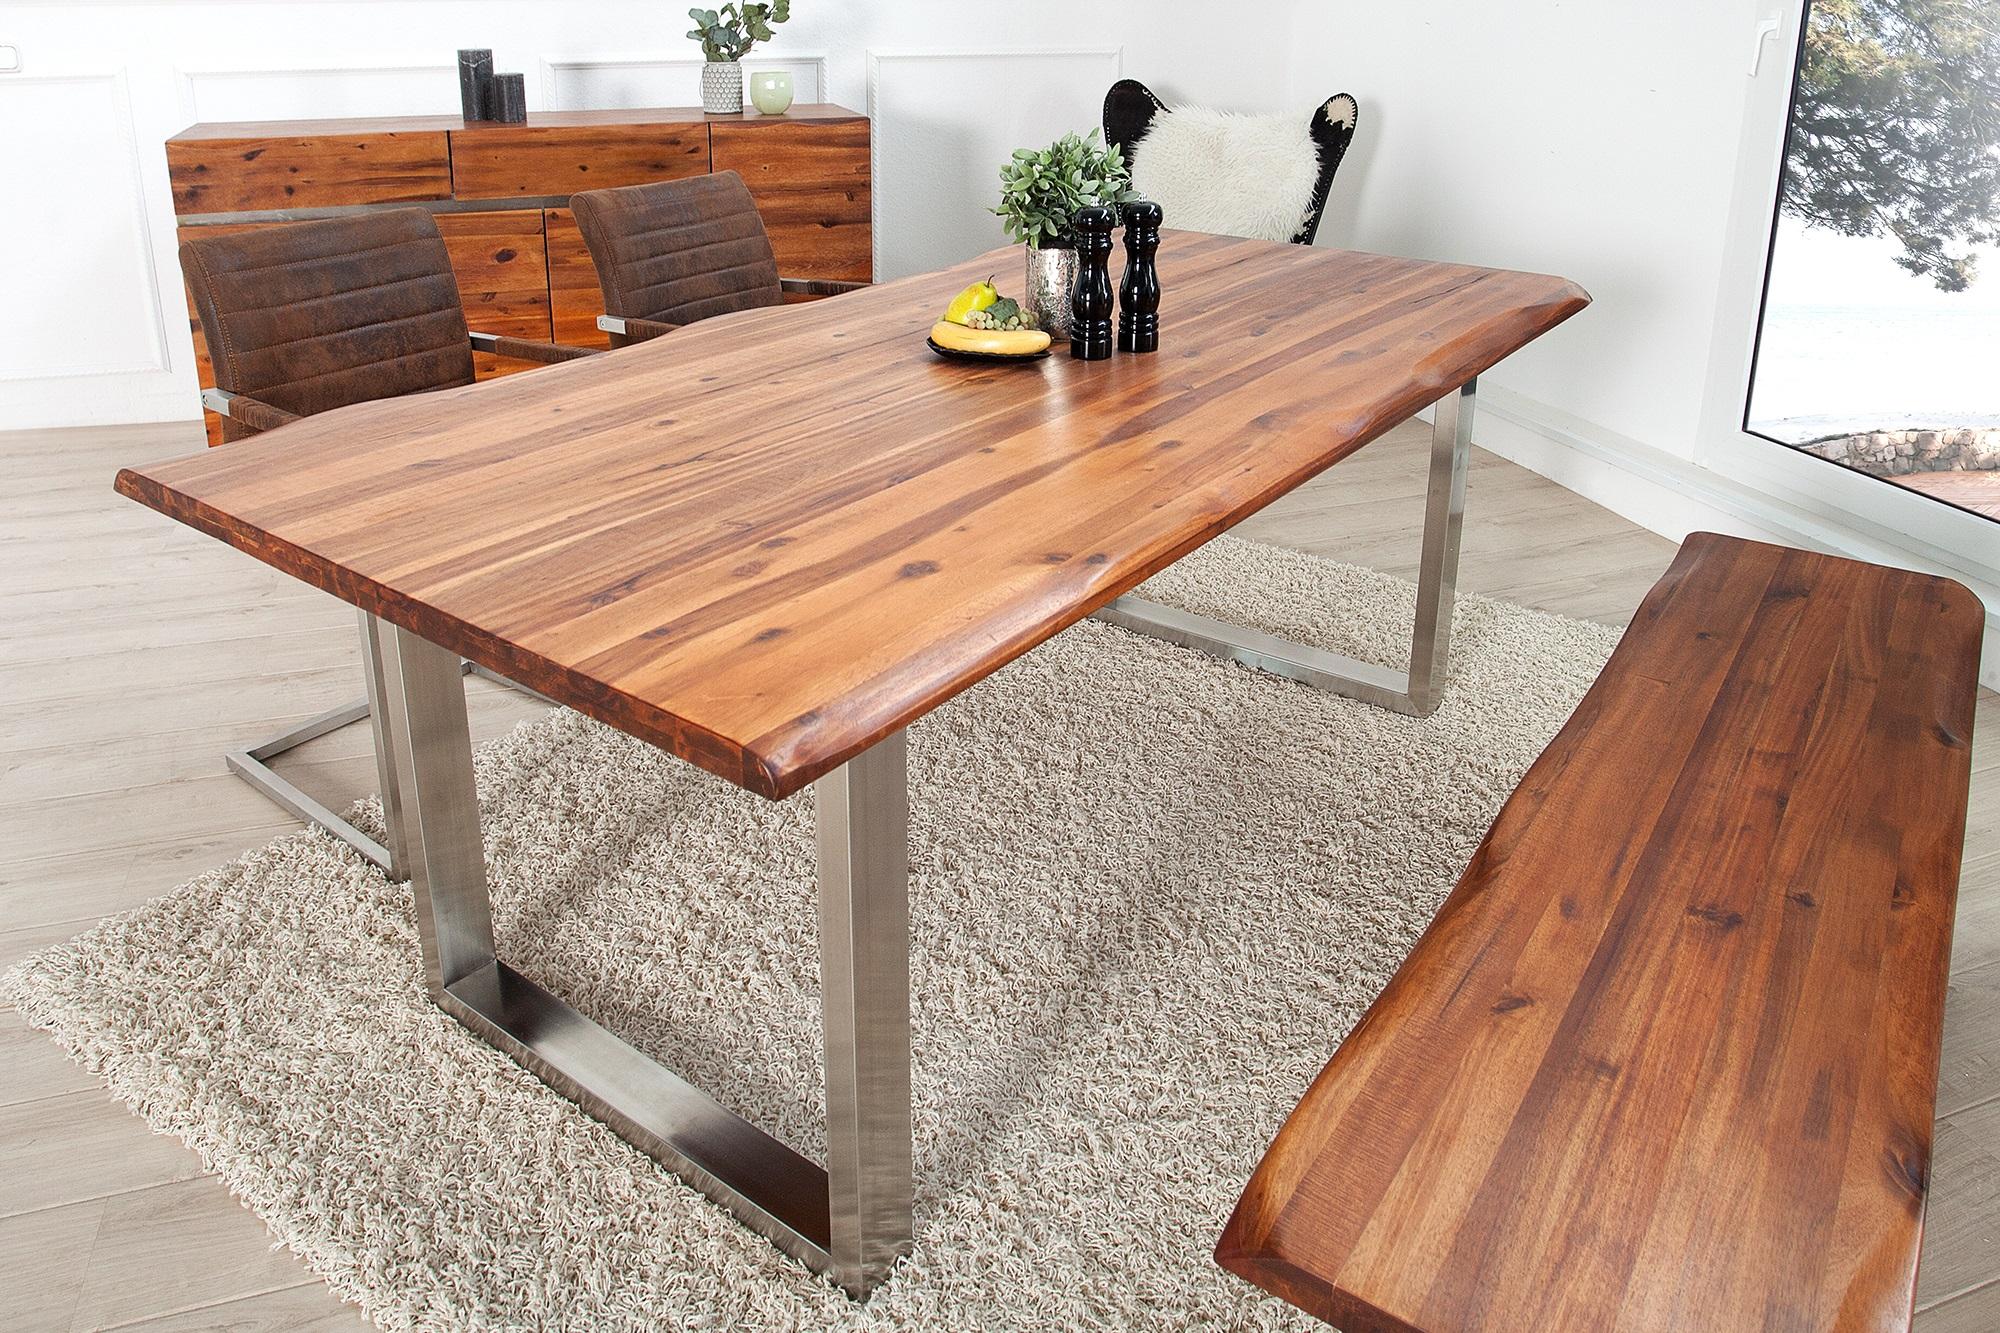 boomstam tafel acacia. Black Bedroom Furniture Sets. Home Design Ideas